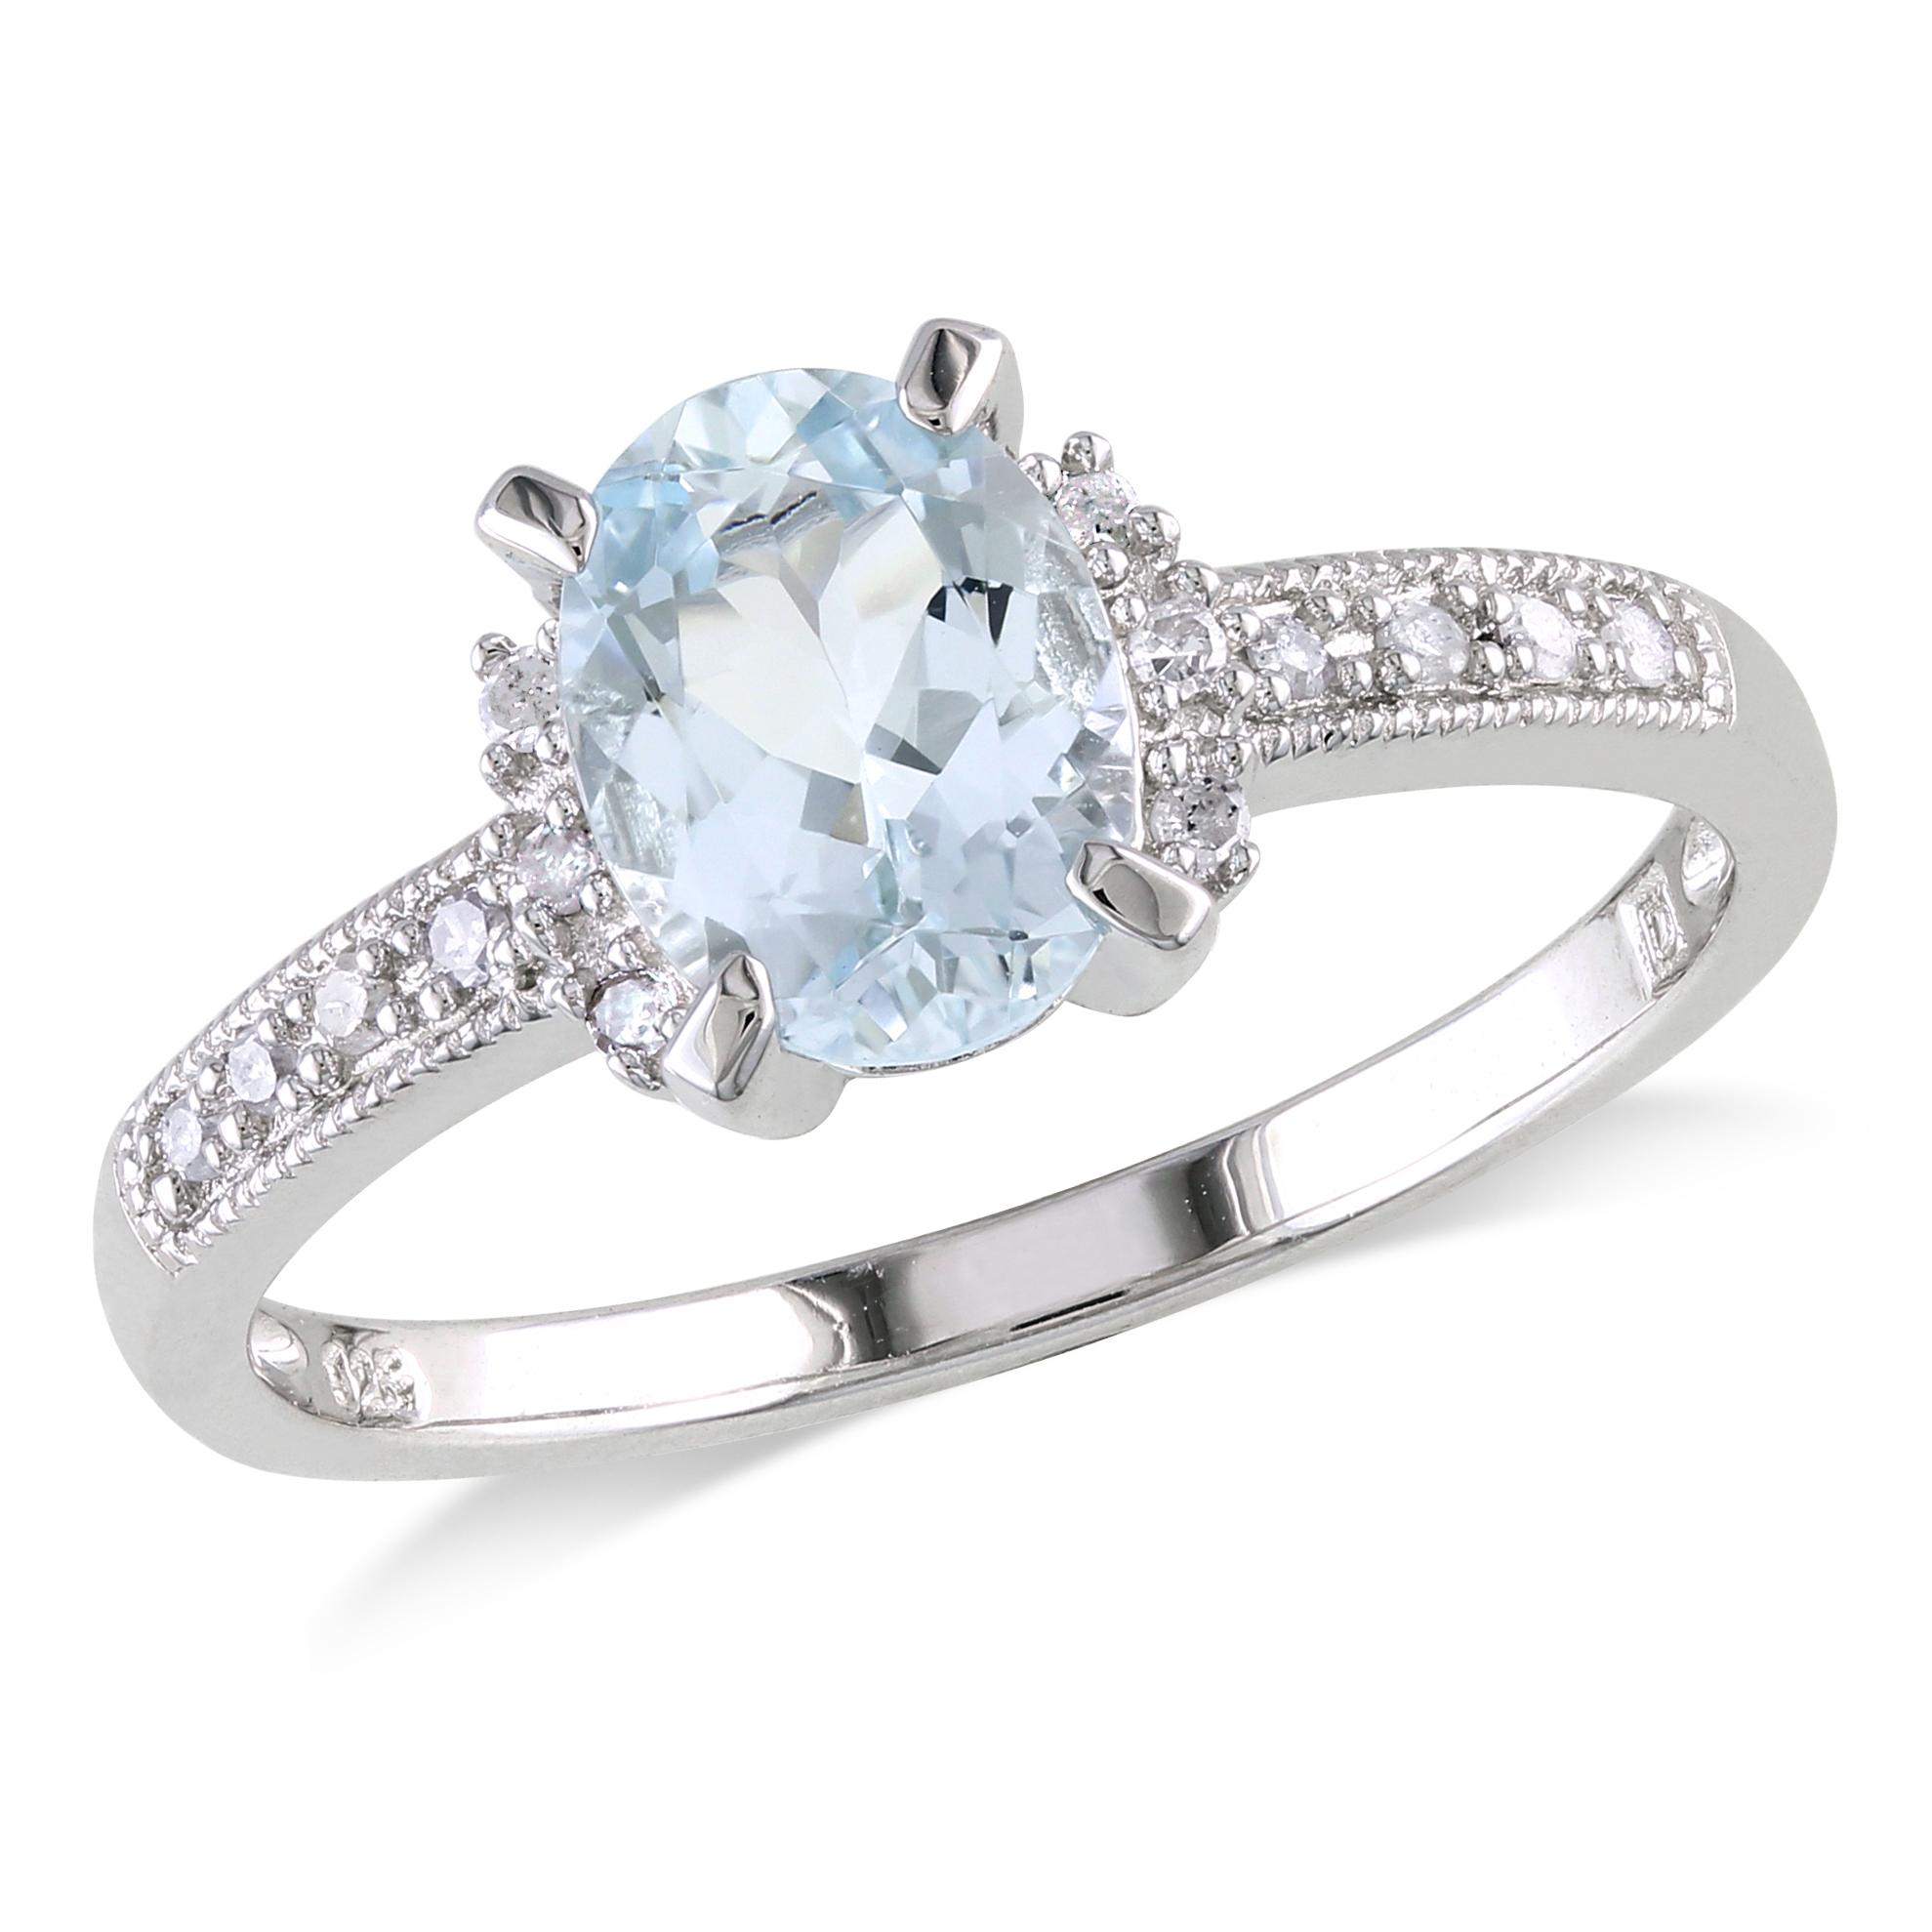 b wedding rings for women Gemstone